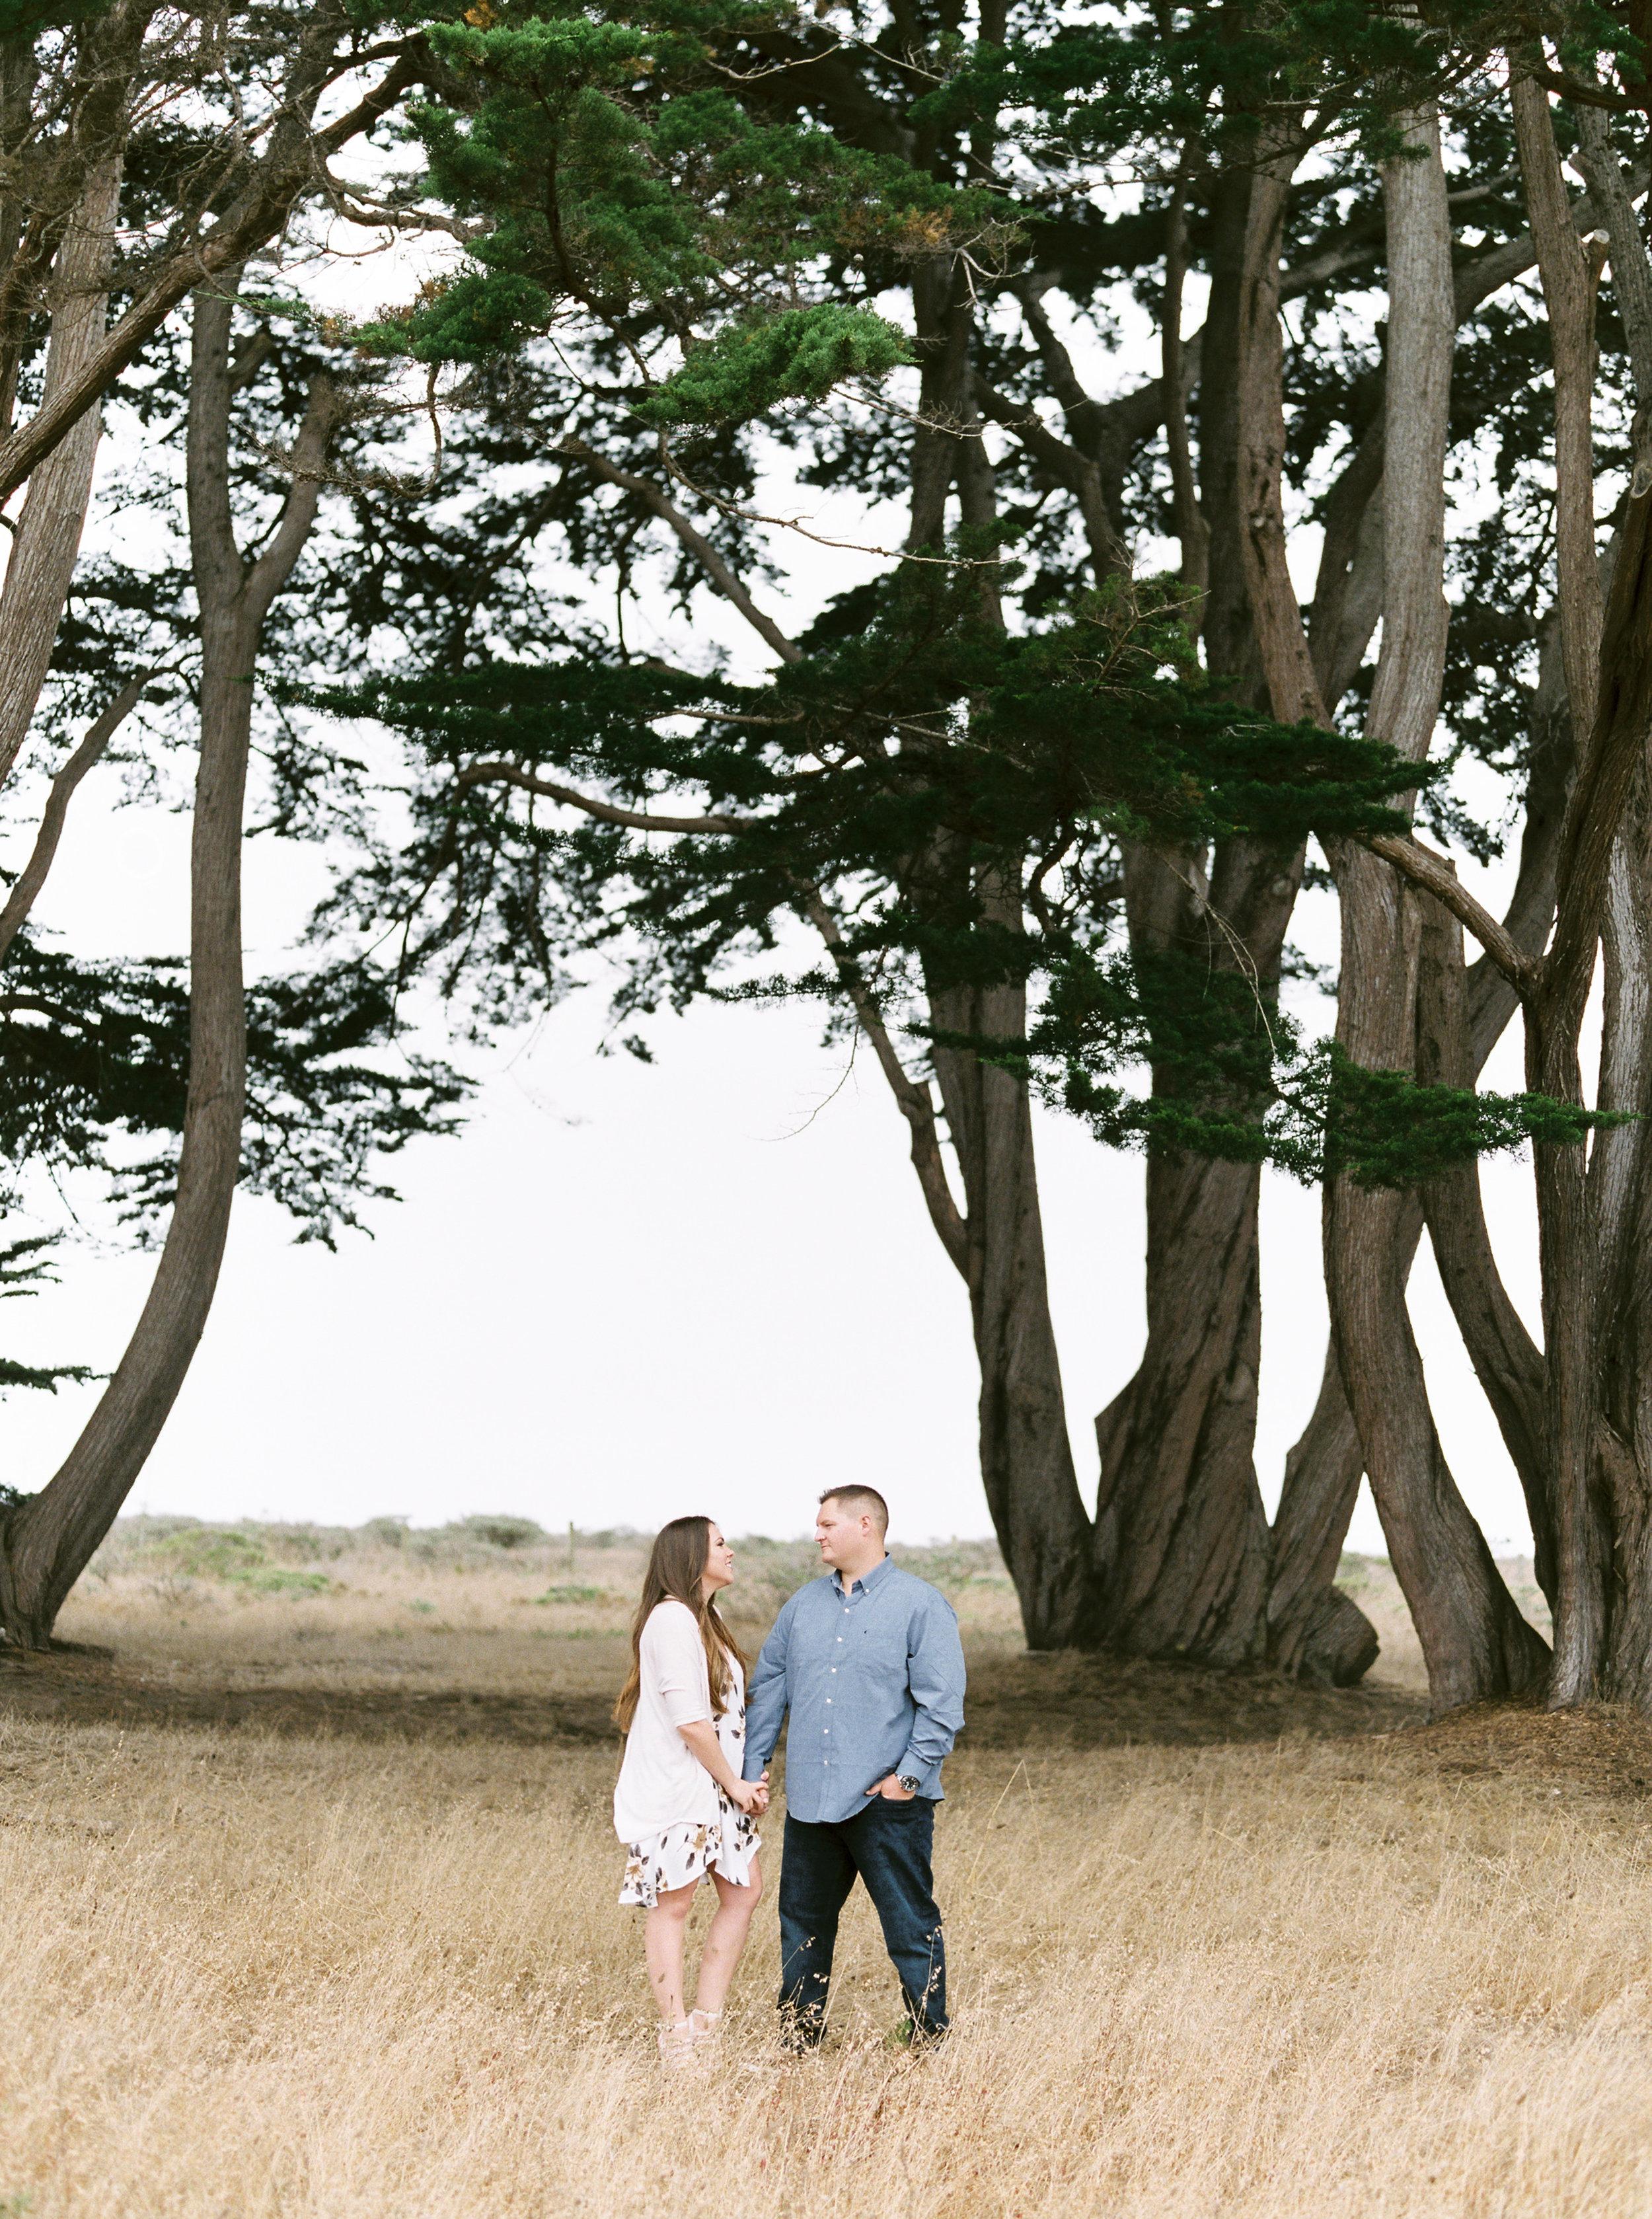 Point-reyes-california-engagement-photographer-41.jpg